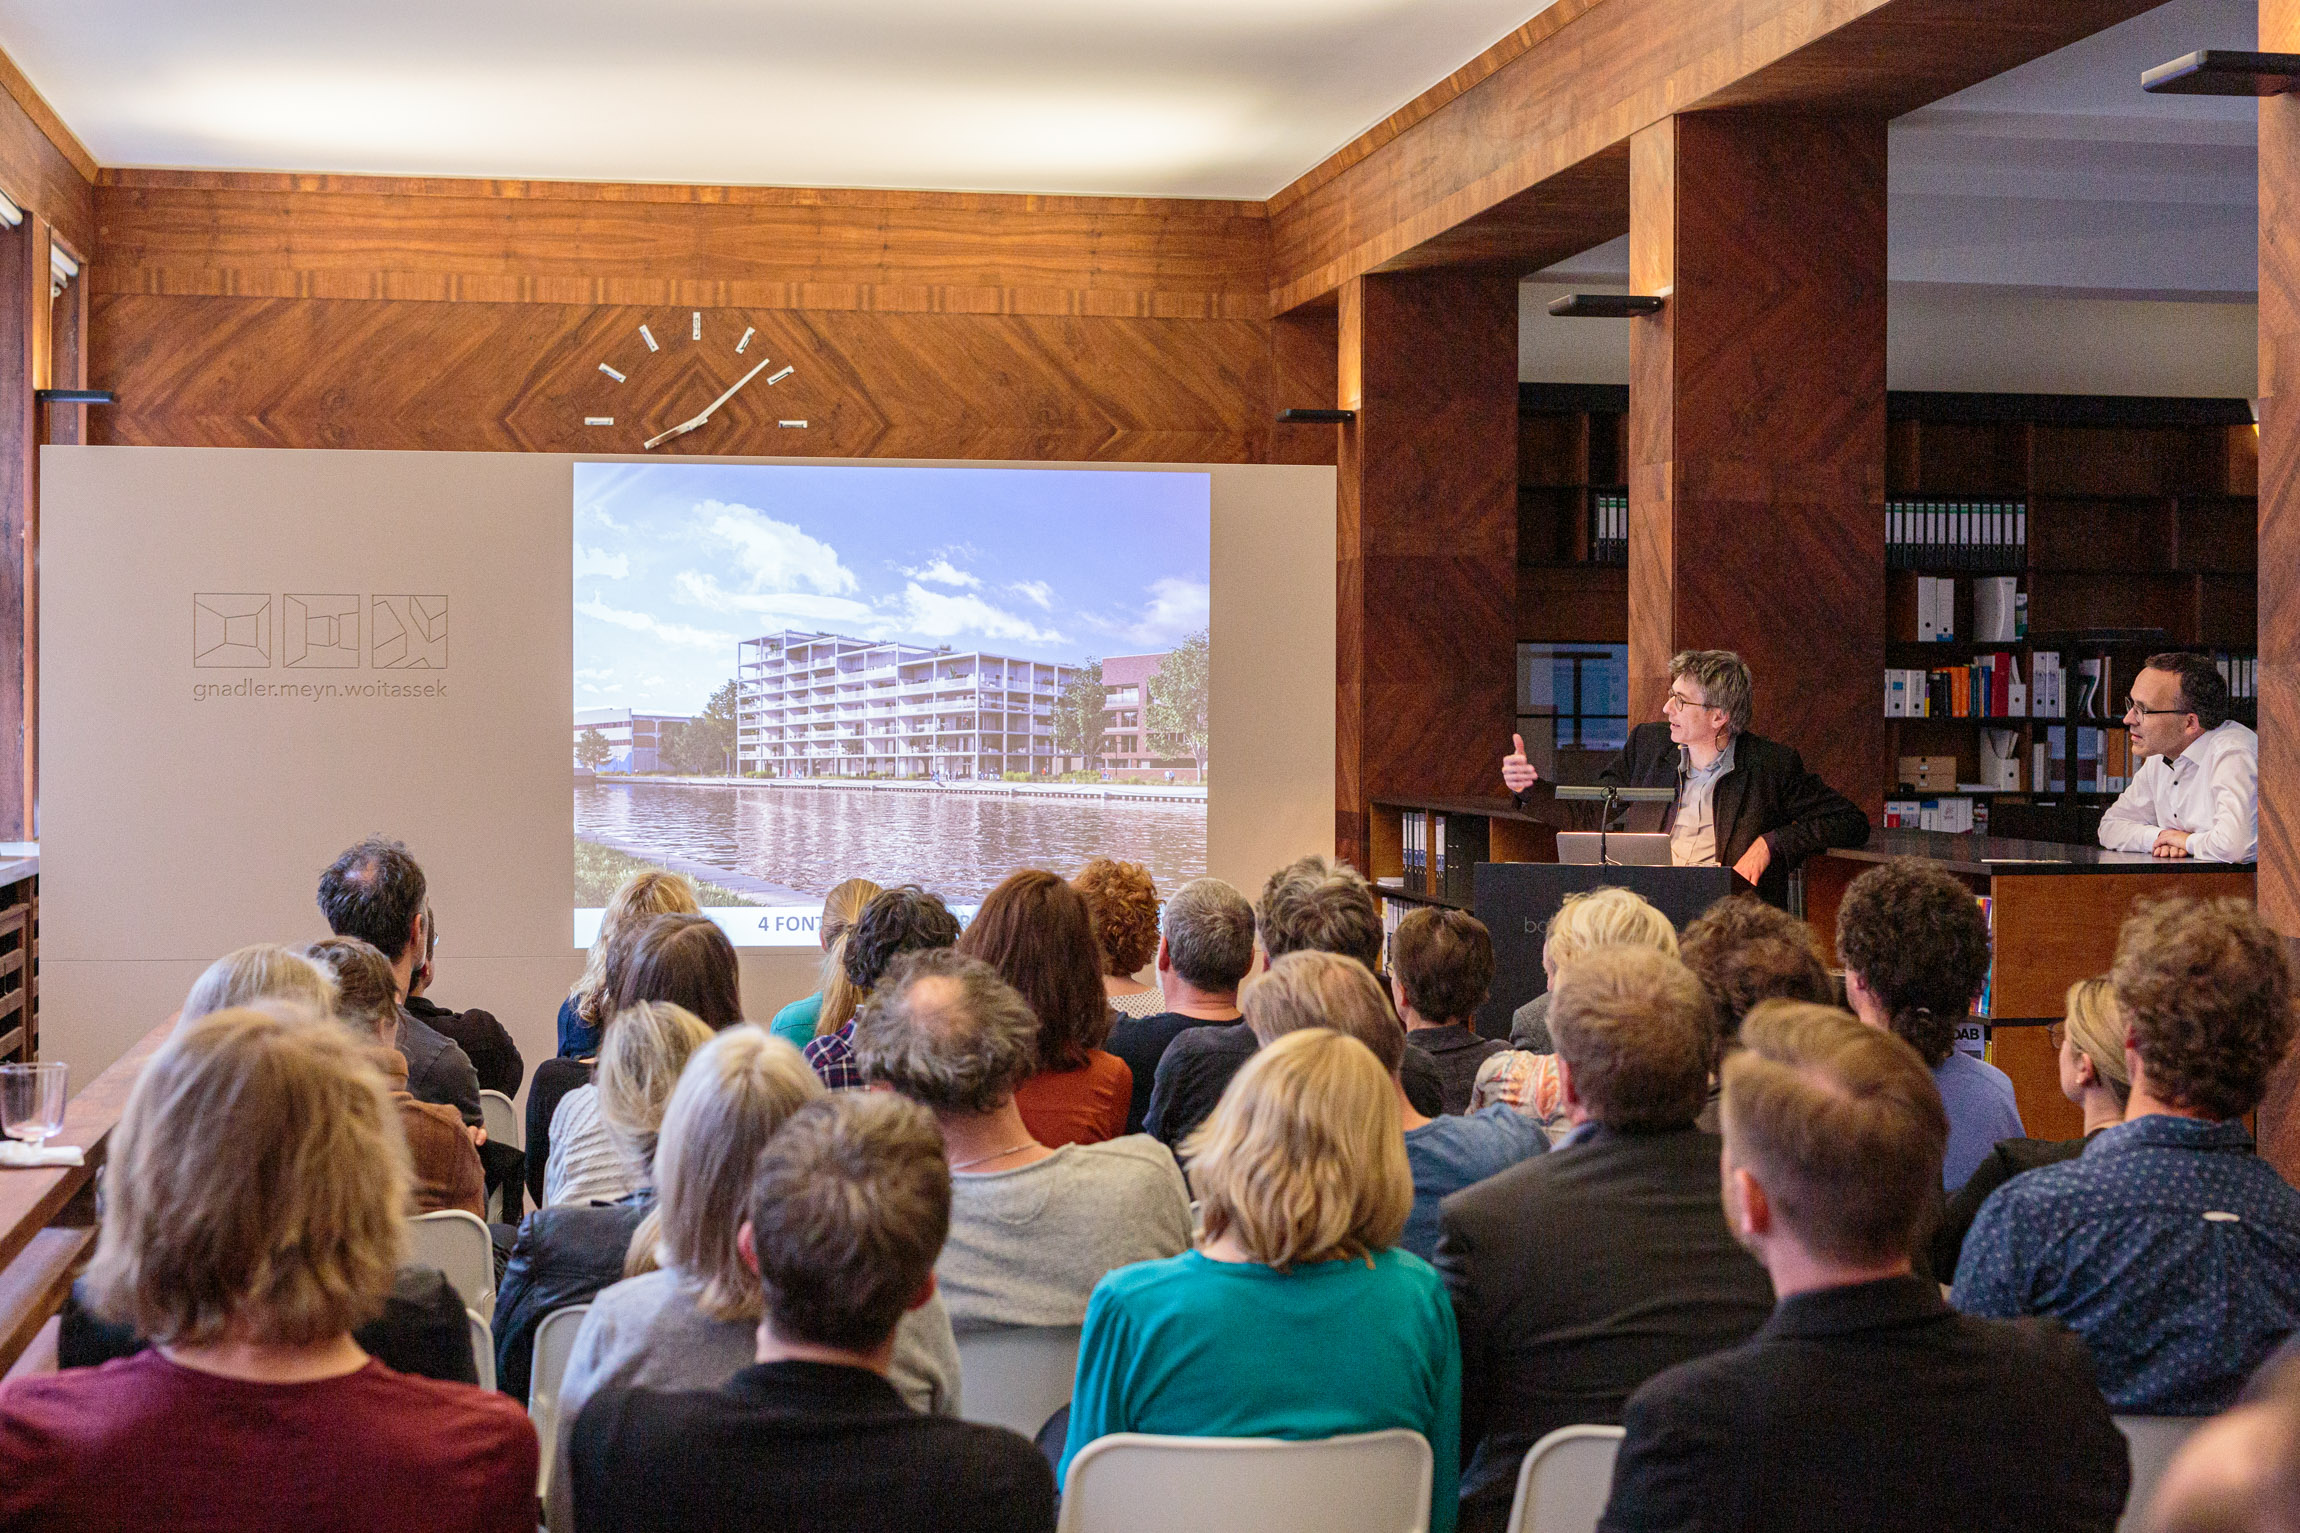 Erstes bank[d]ruecken mit dem Atelier Kempe-Thill aus Rotterdam